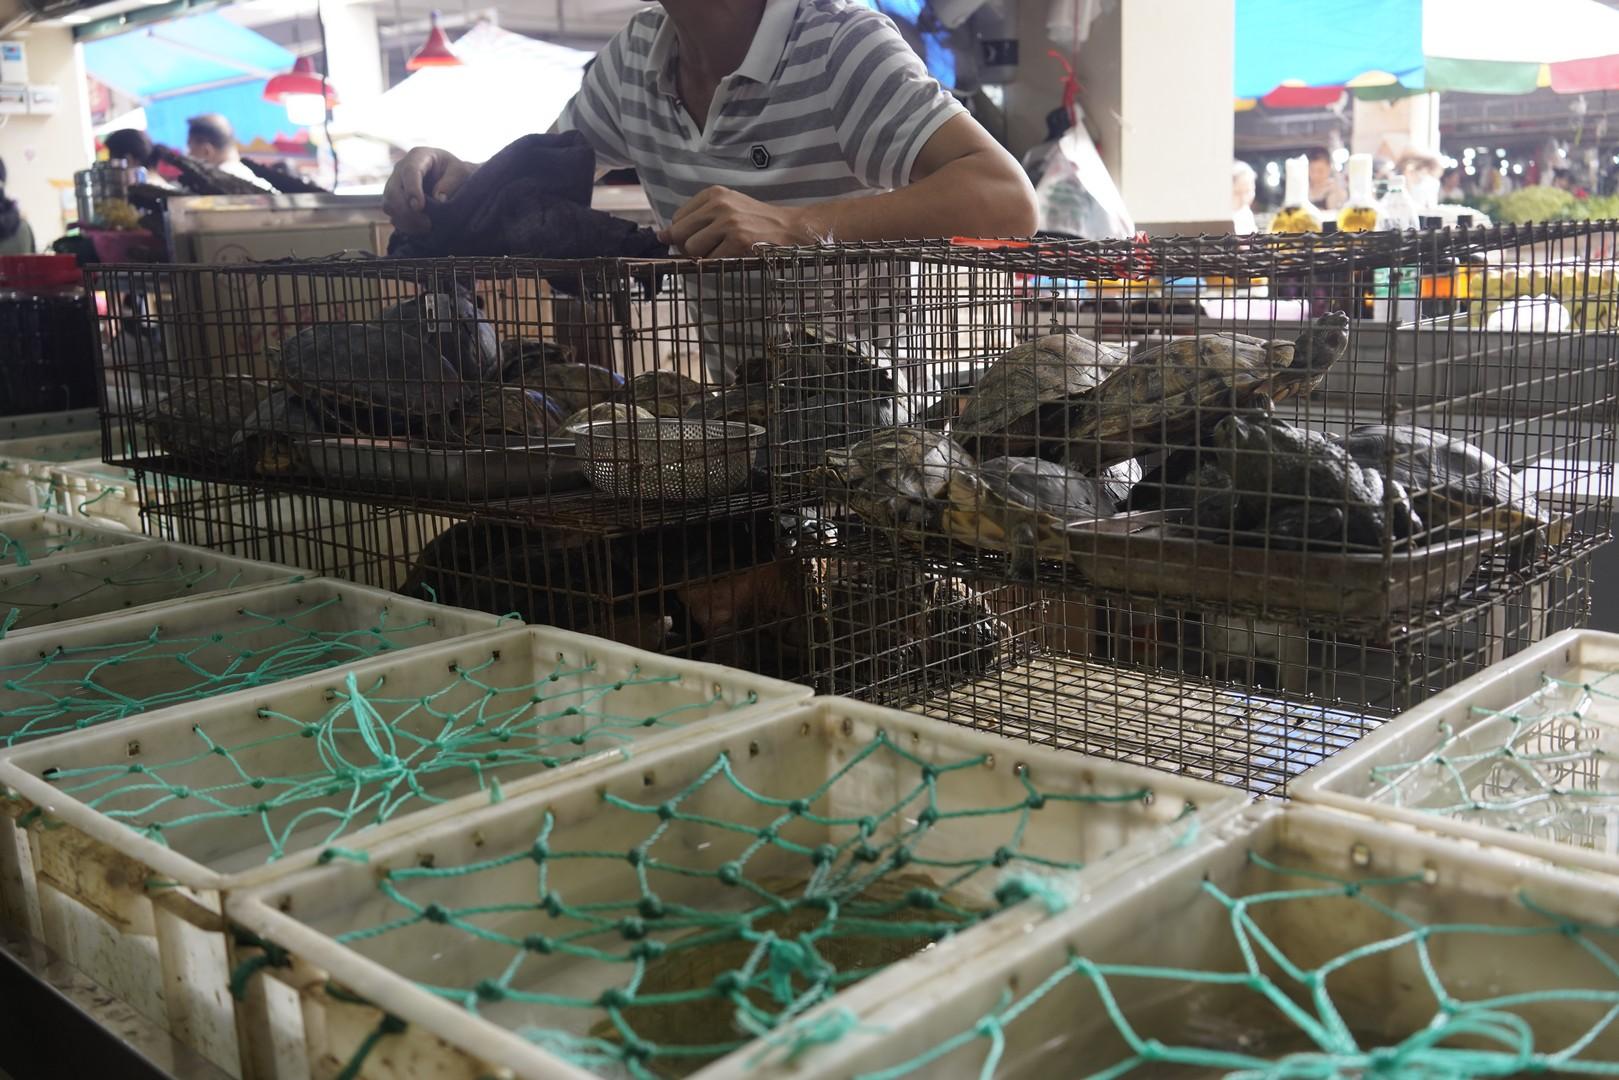 Un'immagine dai wet market in Cina